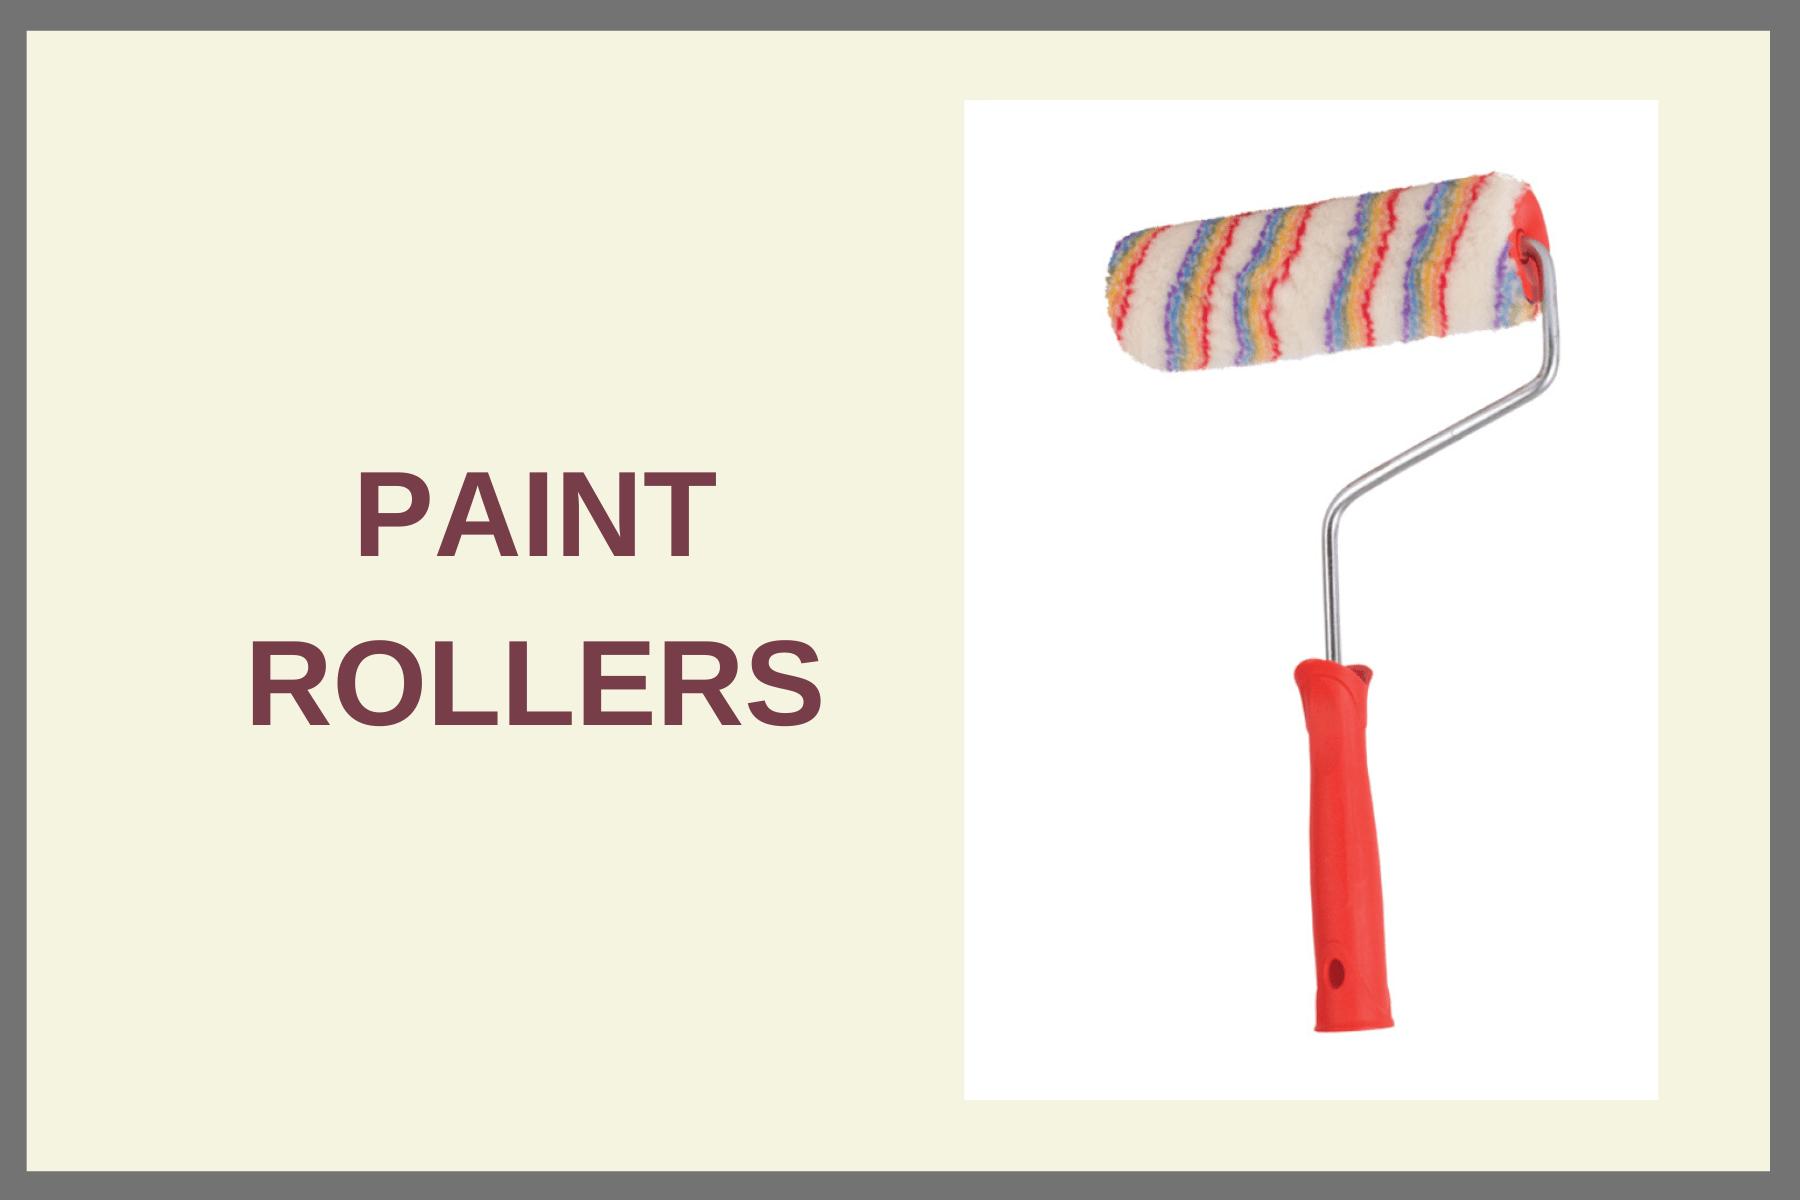 paint roller rollers painter painters rullo farbrolle rouleau de peinture